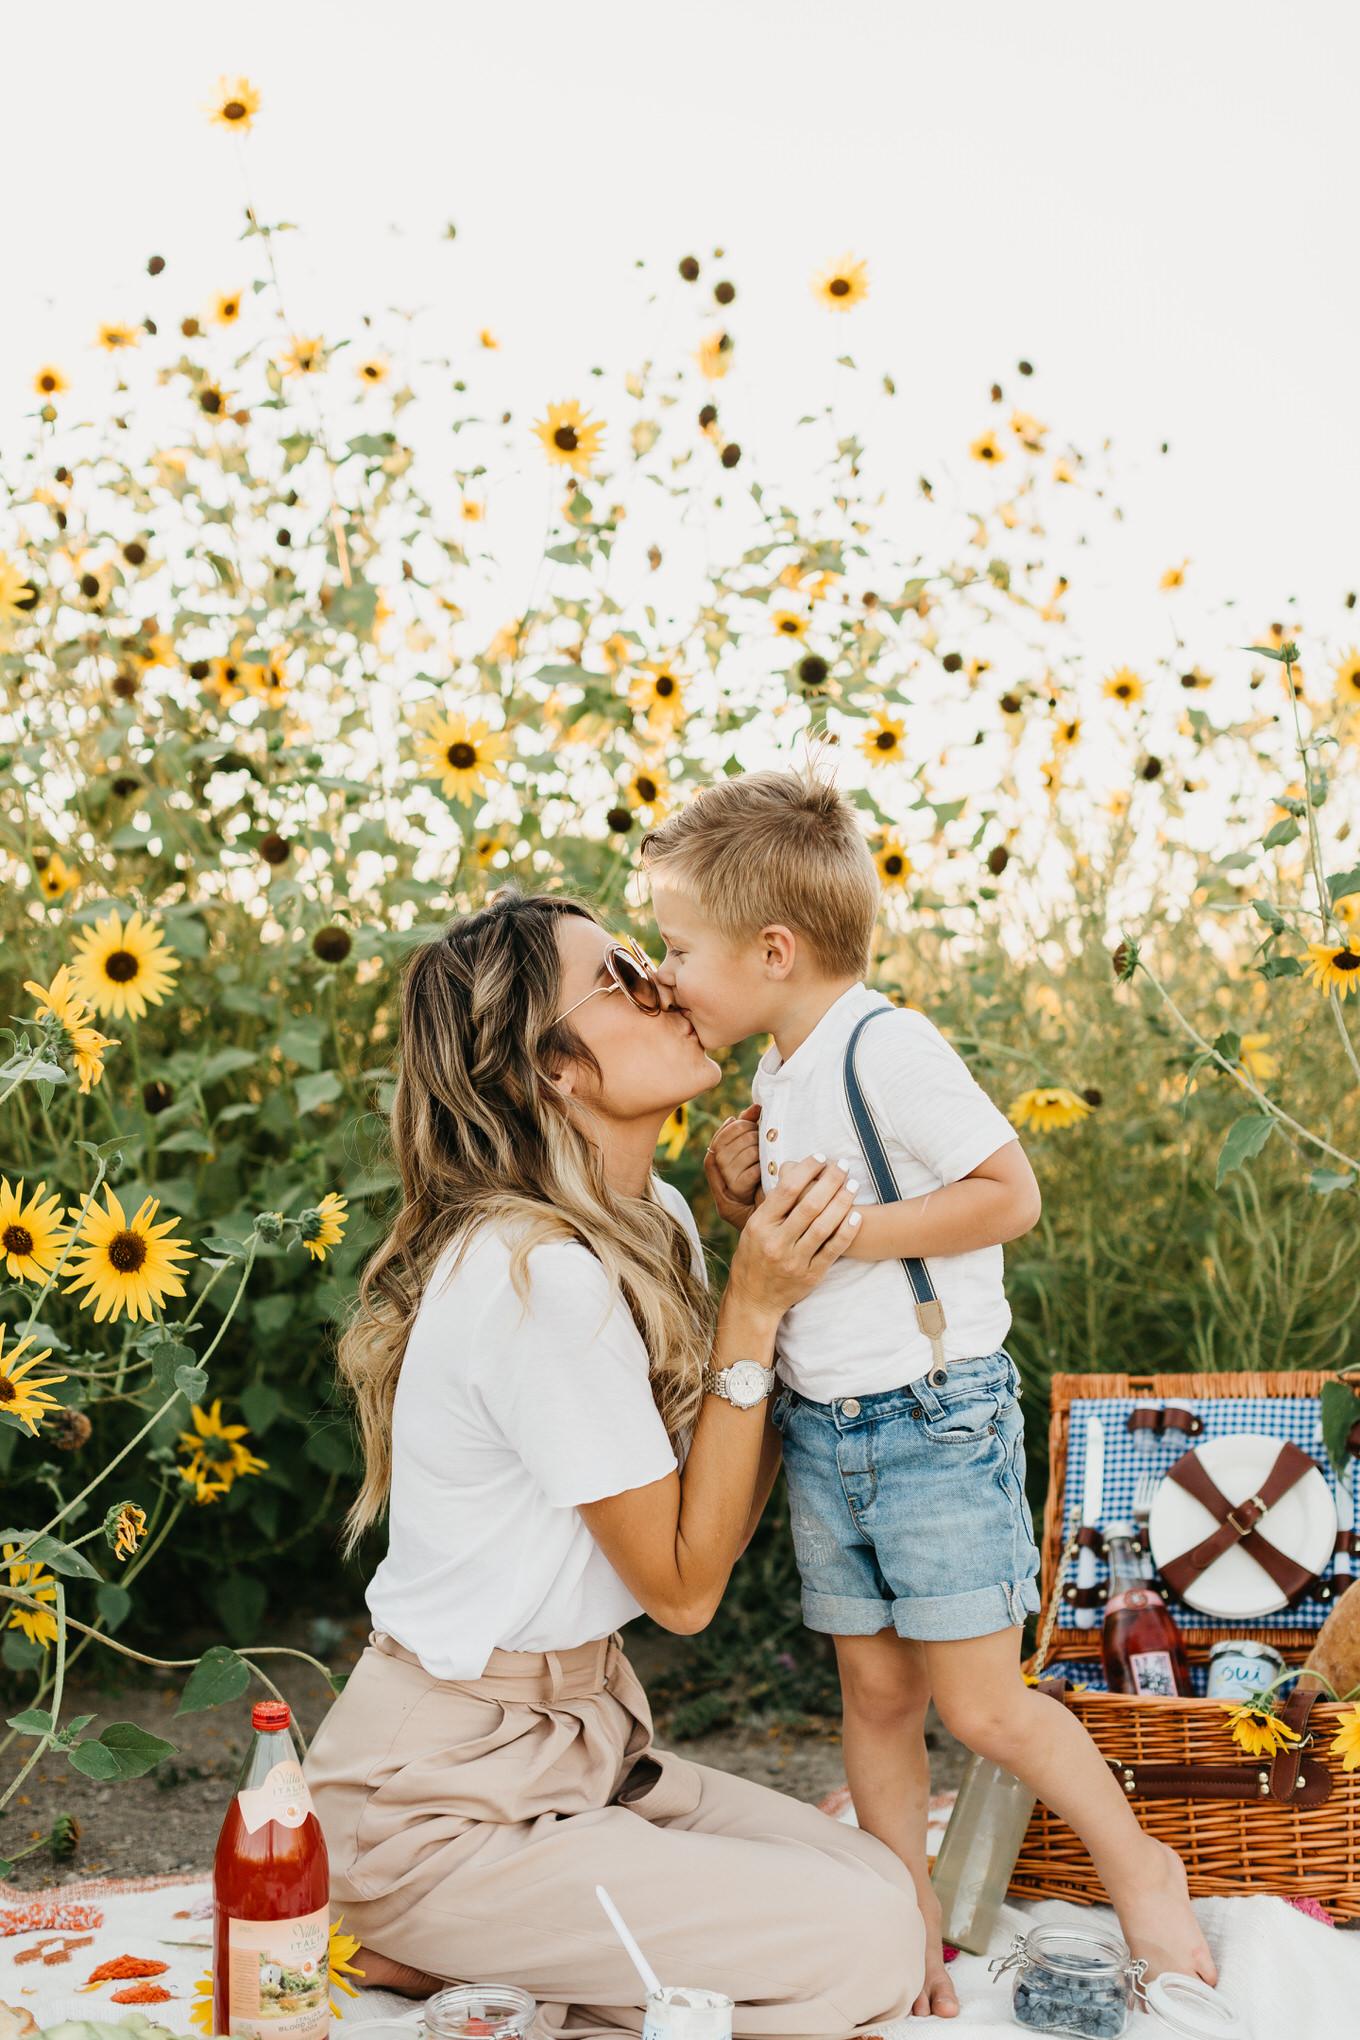 Mom & Son Date Night Ideas